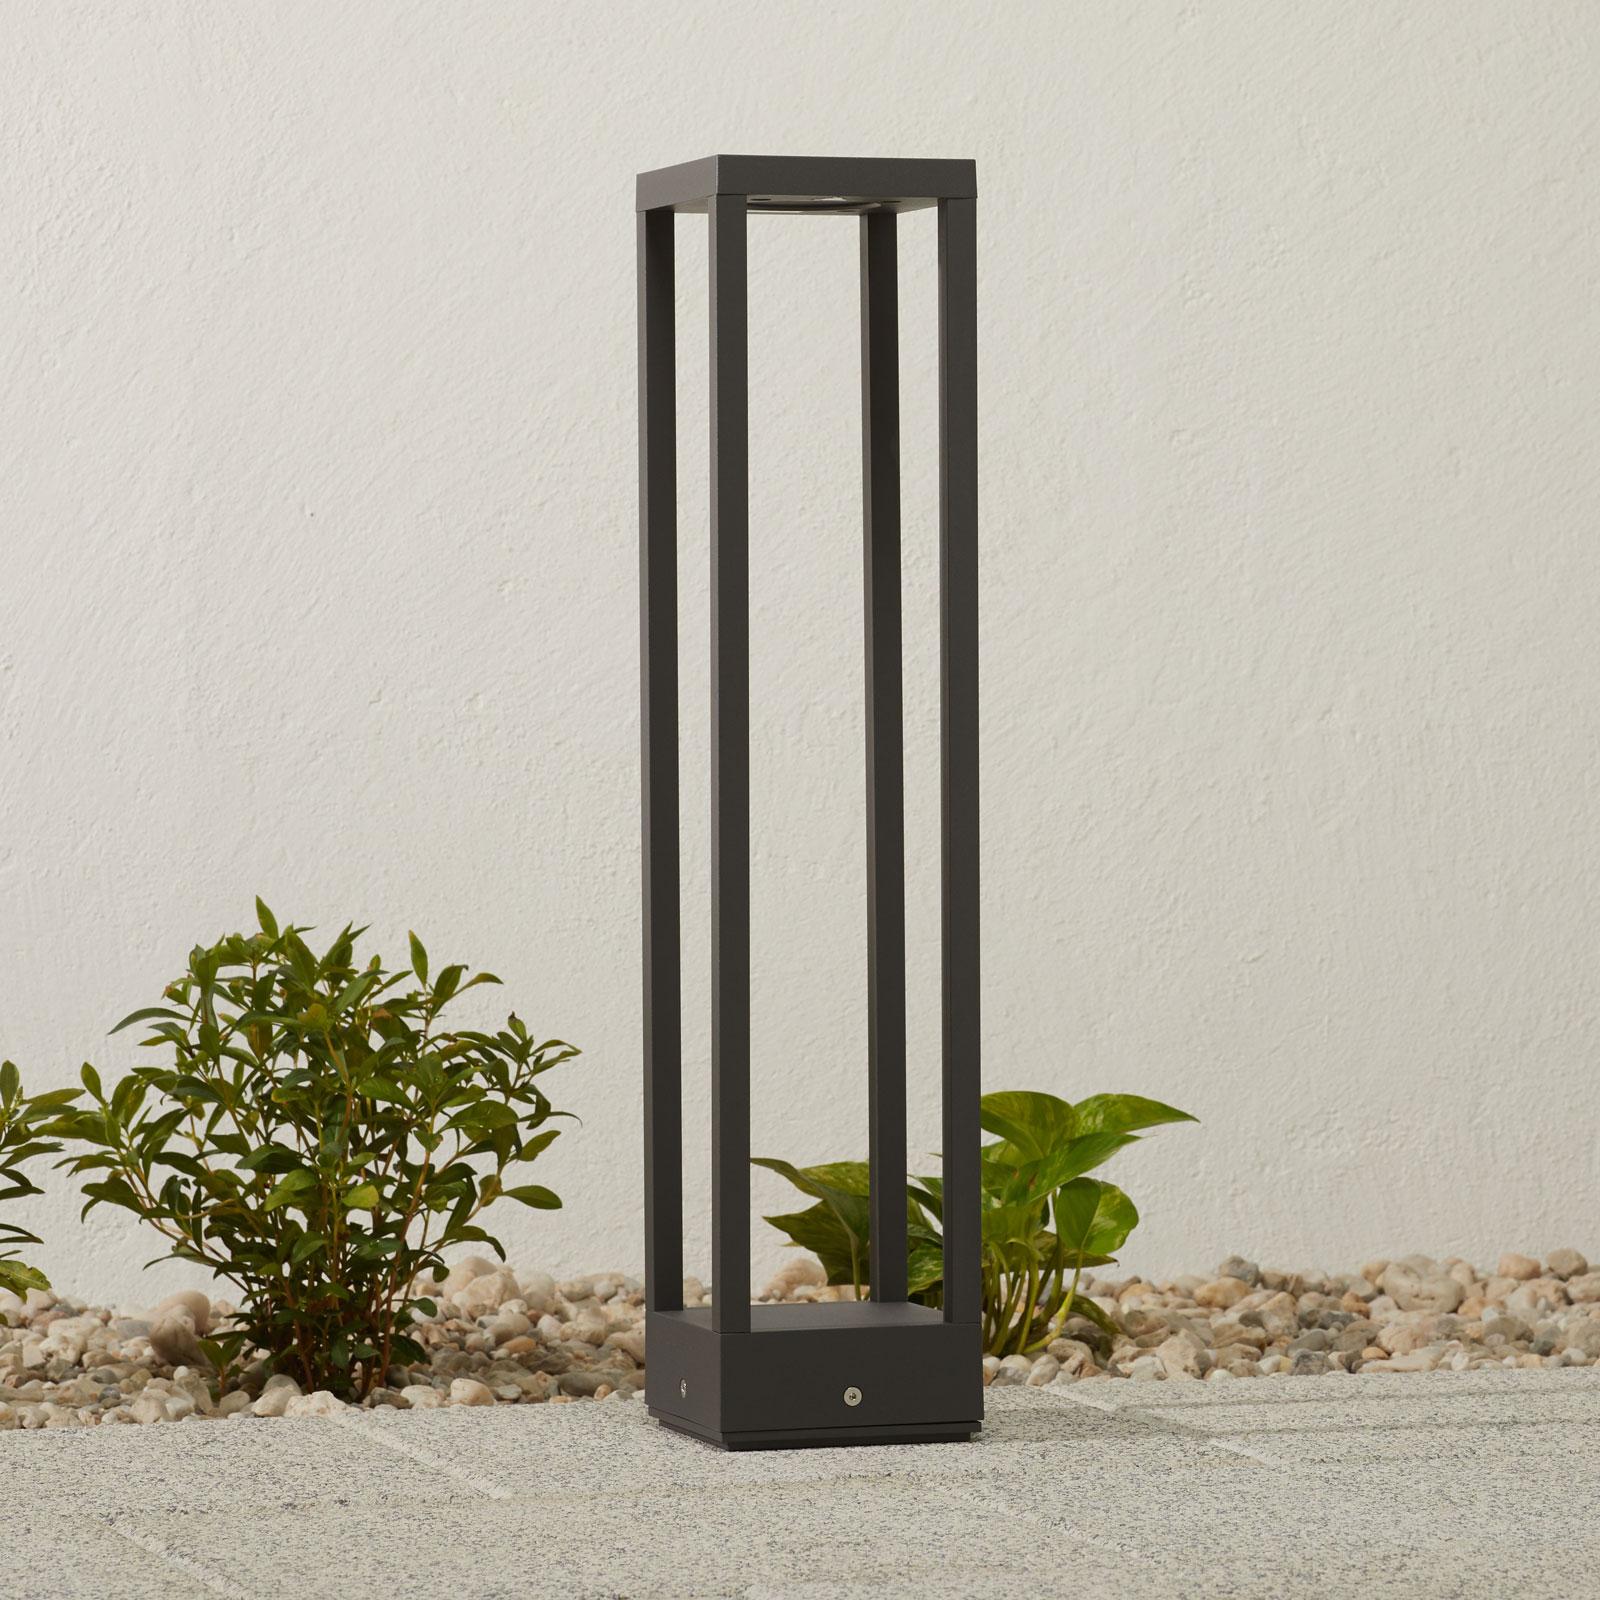 LED-Wegelampe Carlota, dunkelgrau, 65 cm